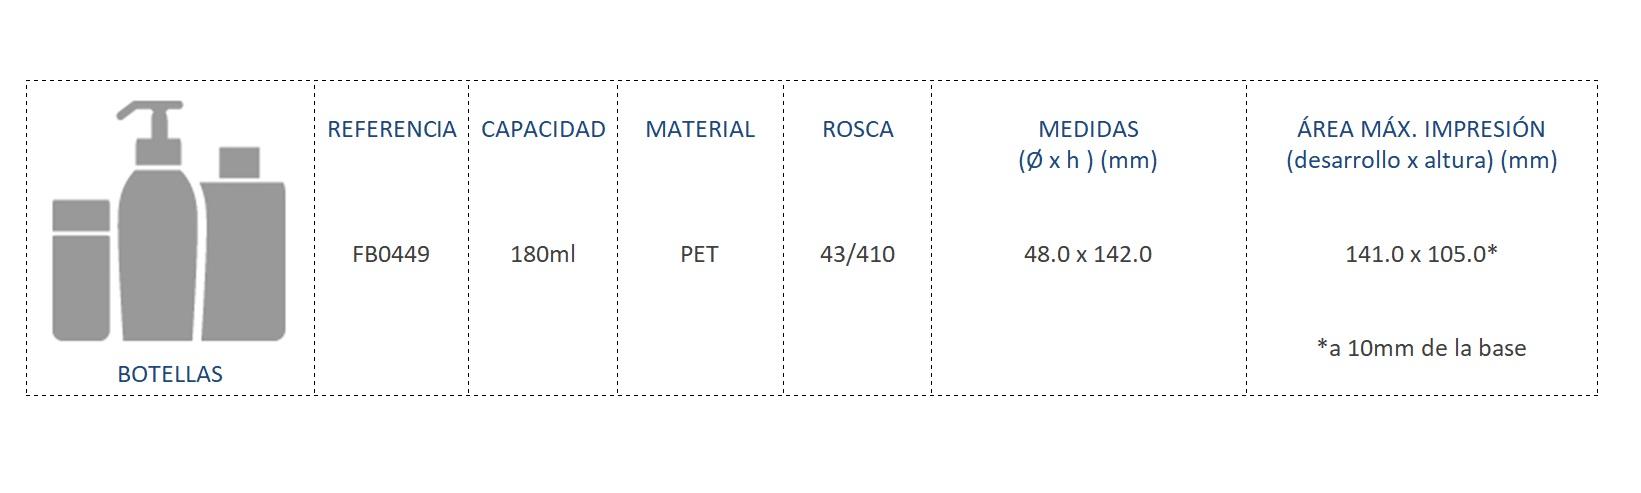 Cuadro de materiales FB0449